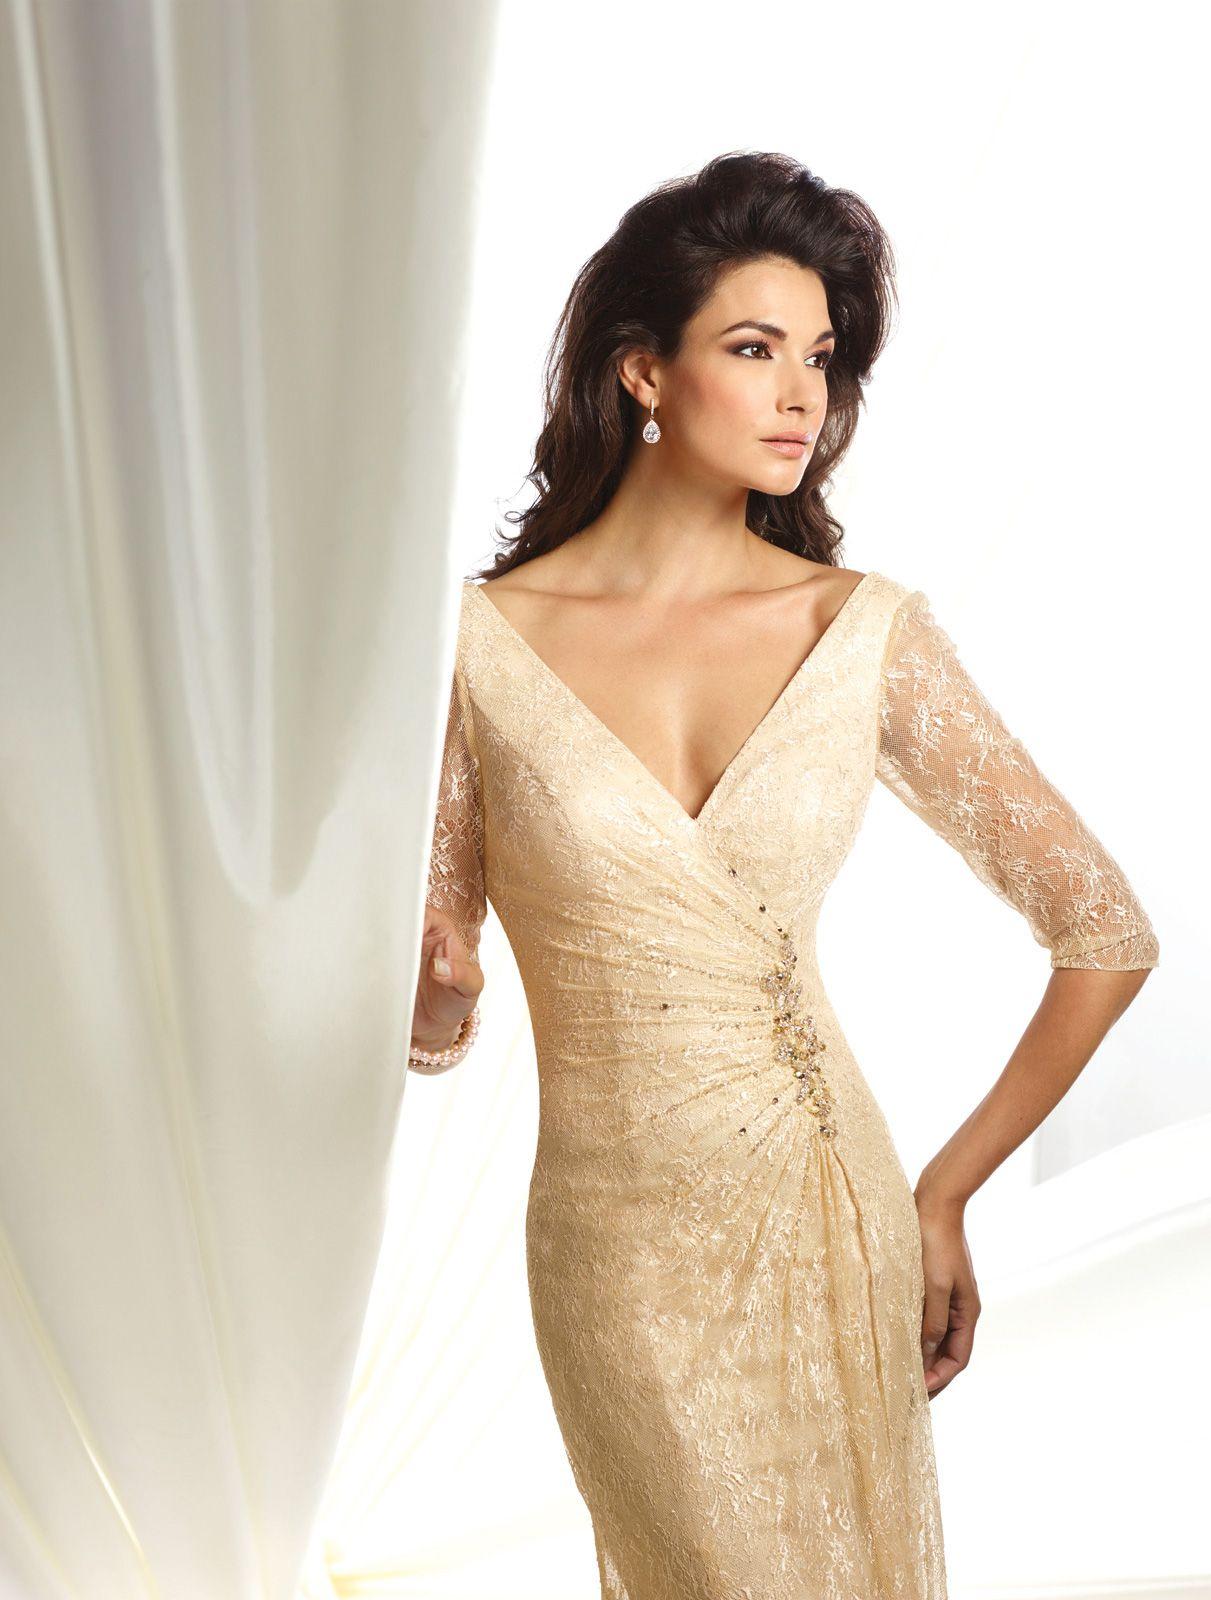 Vestido De Festa - 116932 | Dressy dresses, Dresses, A line gown